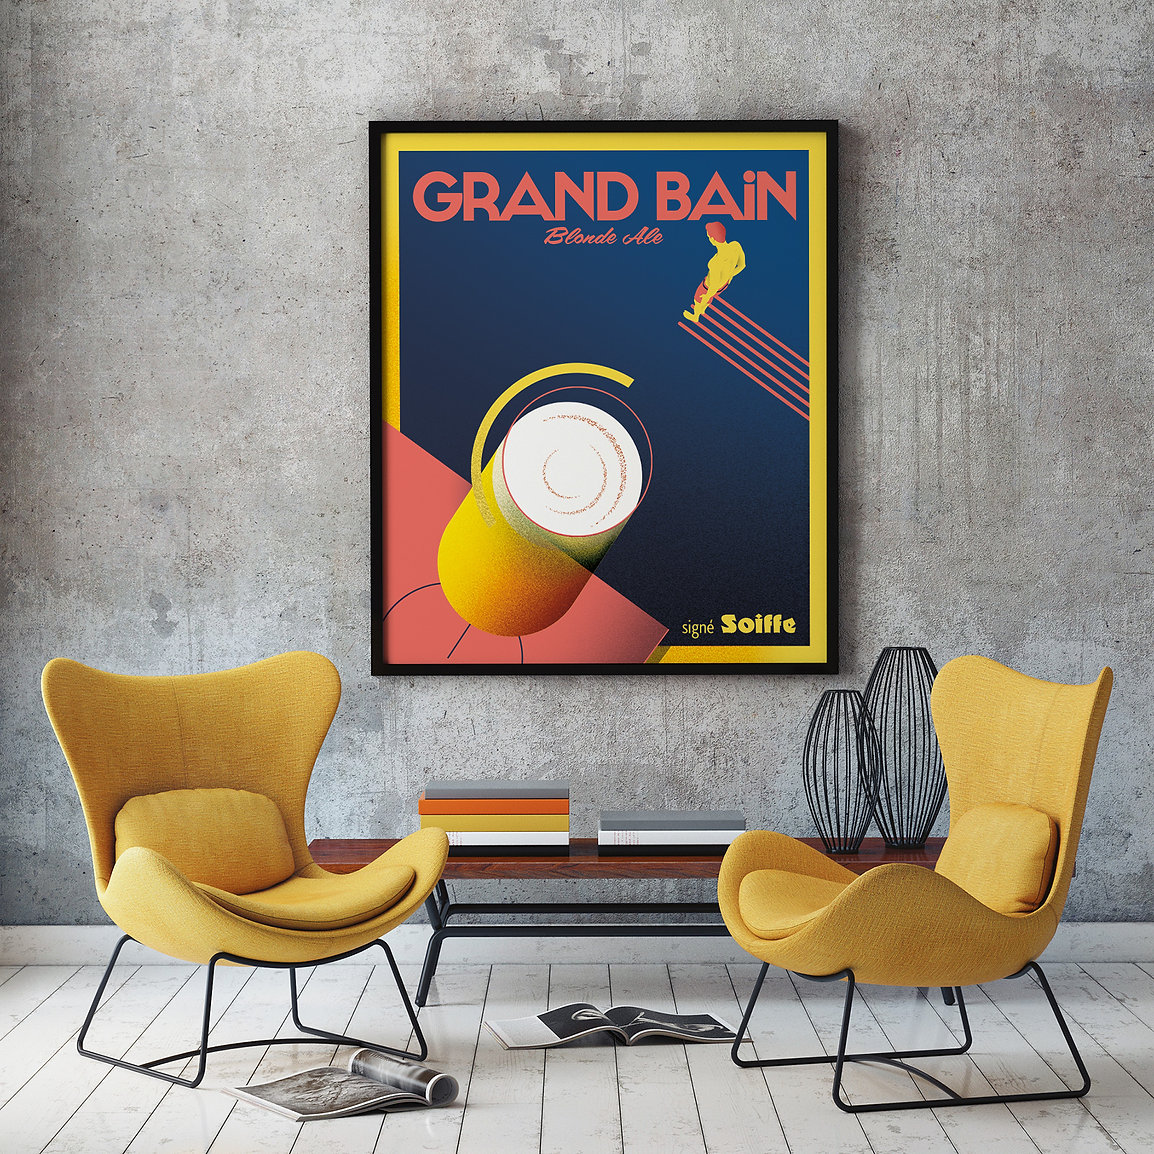 Free-Elegant-Poster-Mockup.jpg